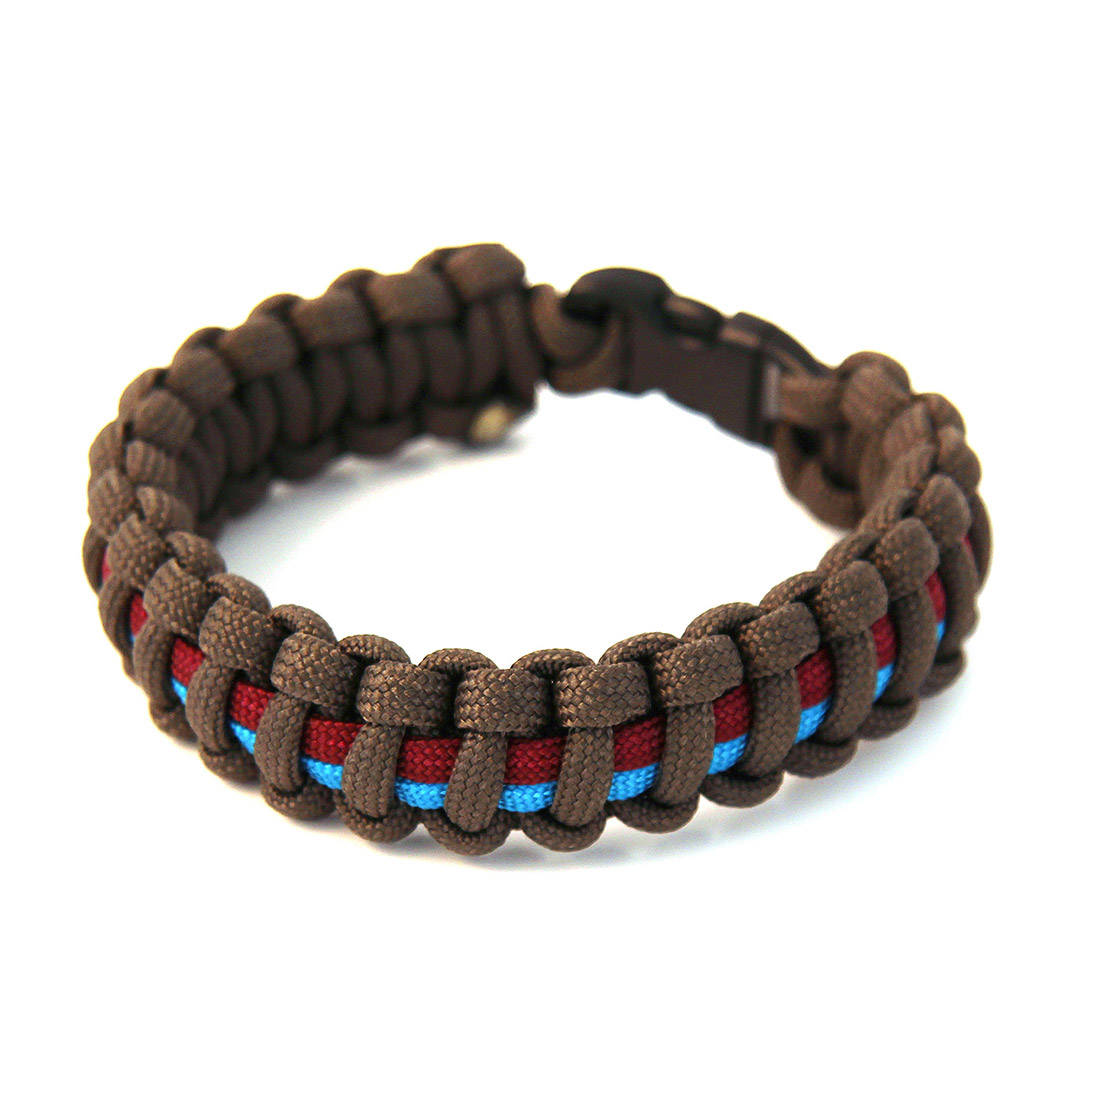 Paracord Survival Bracelet - Olive/Maroon/Blue